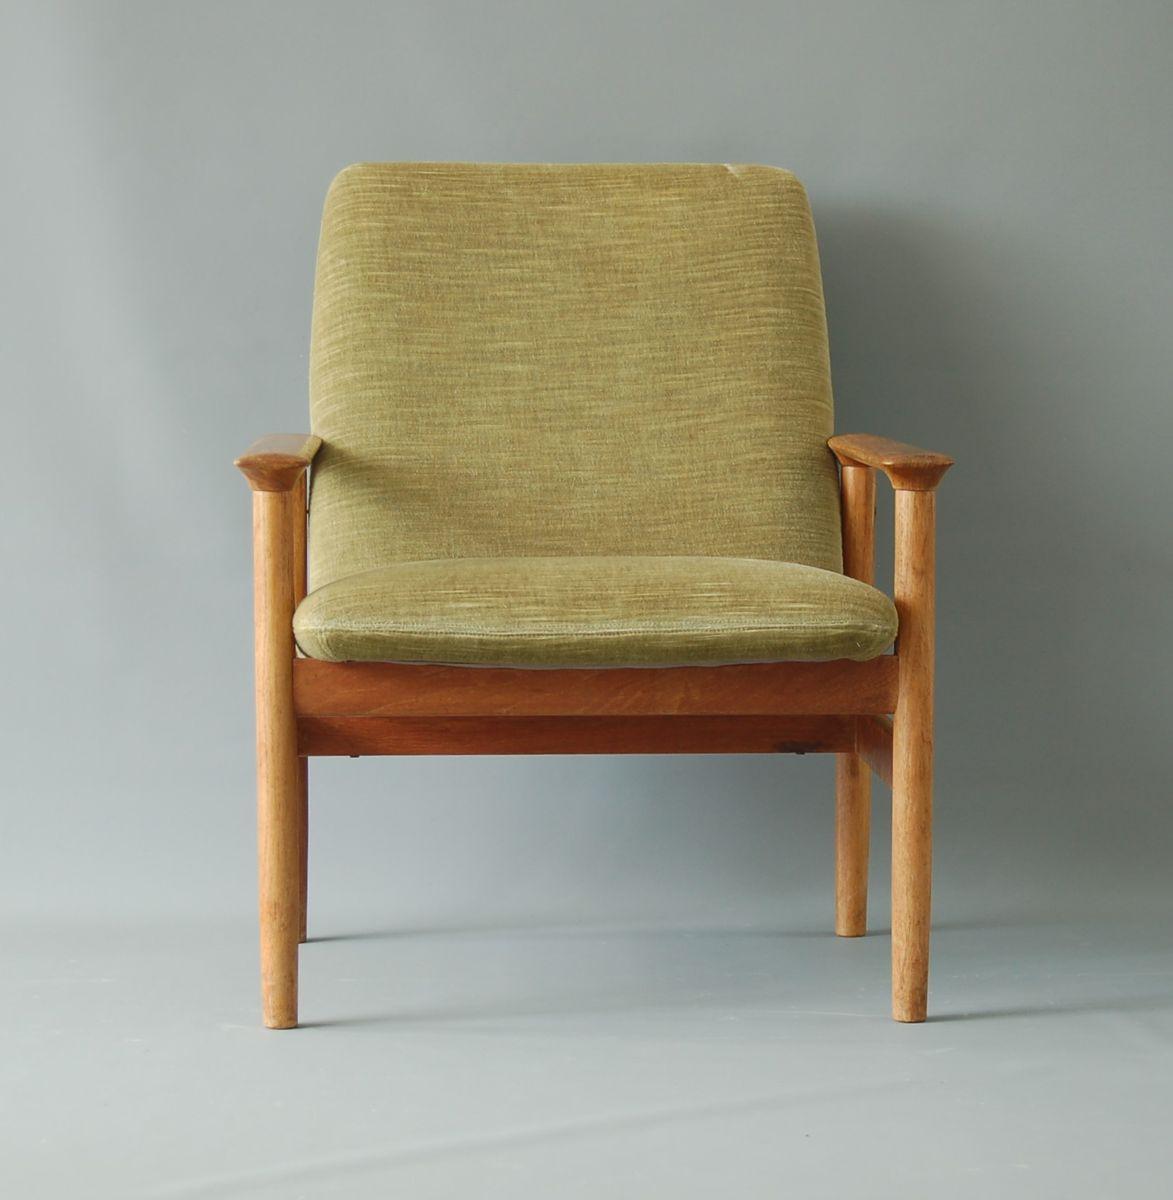 vintage teak sessel bei pamono kaufen. Black Bedroom Furniture Sets. Home Design Ideas